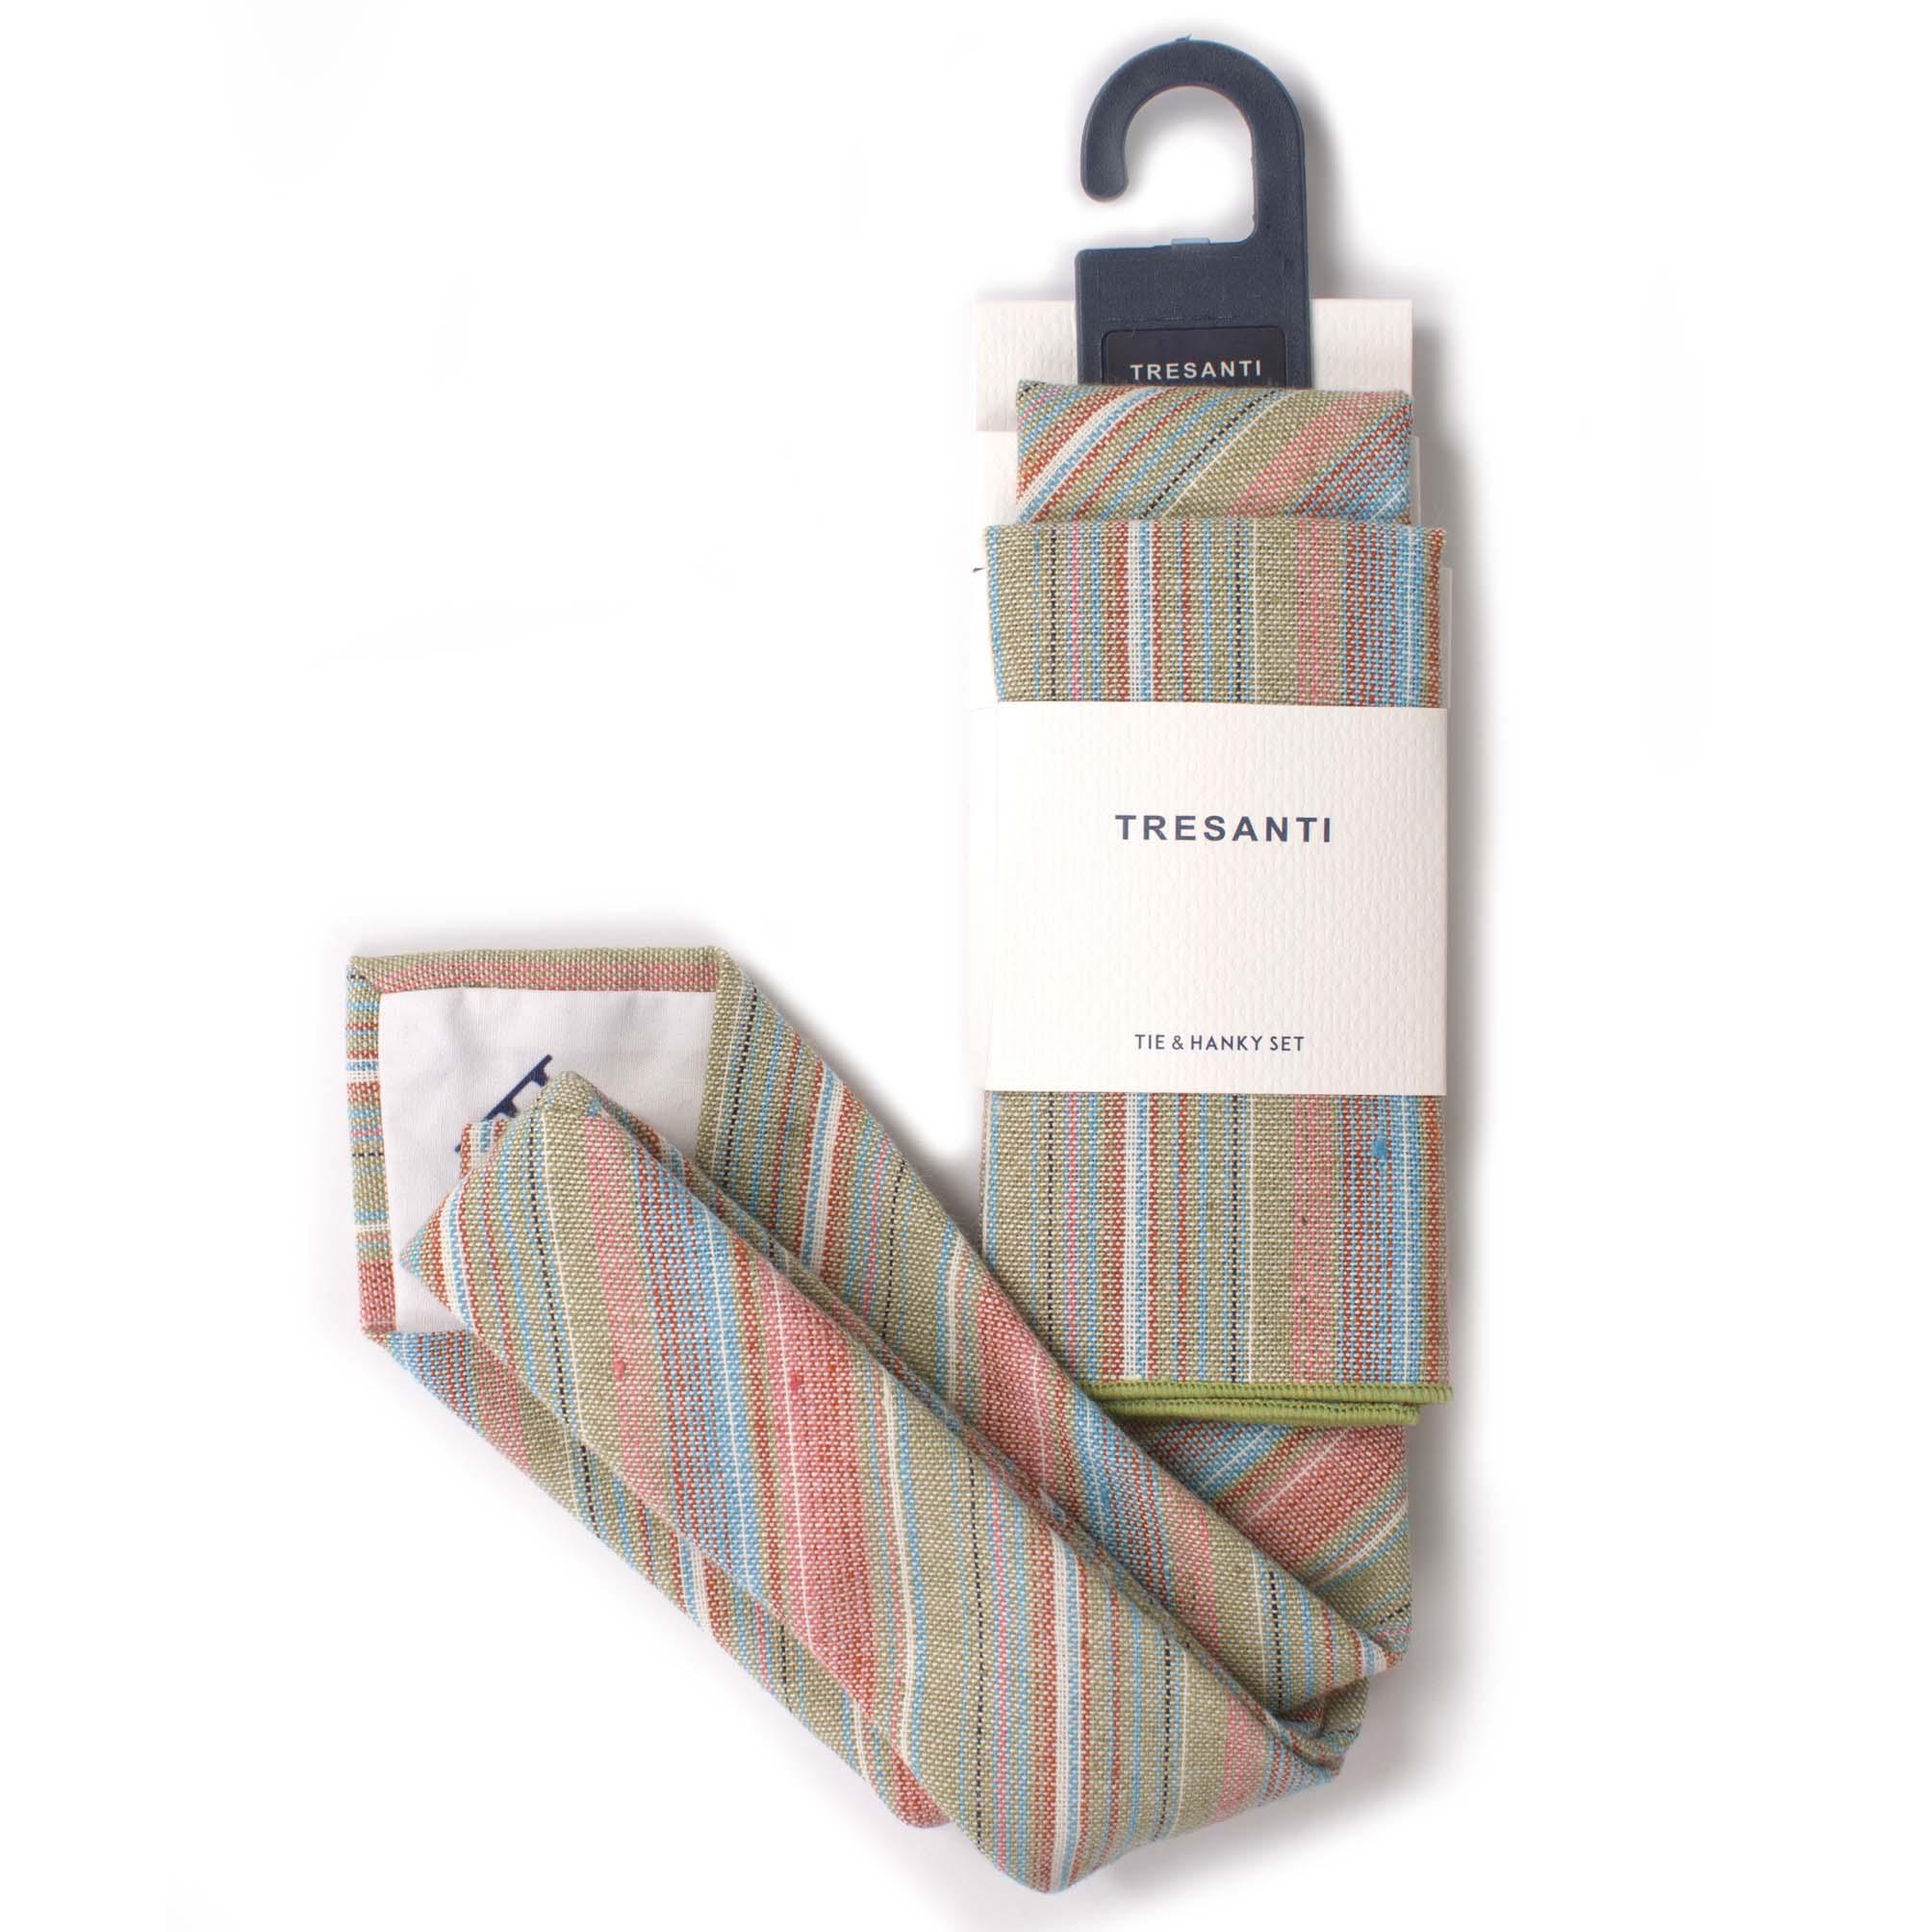 Tie & hanky set linen stripes